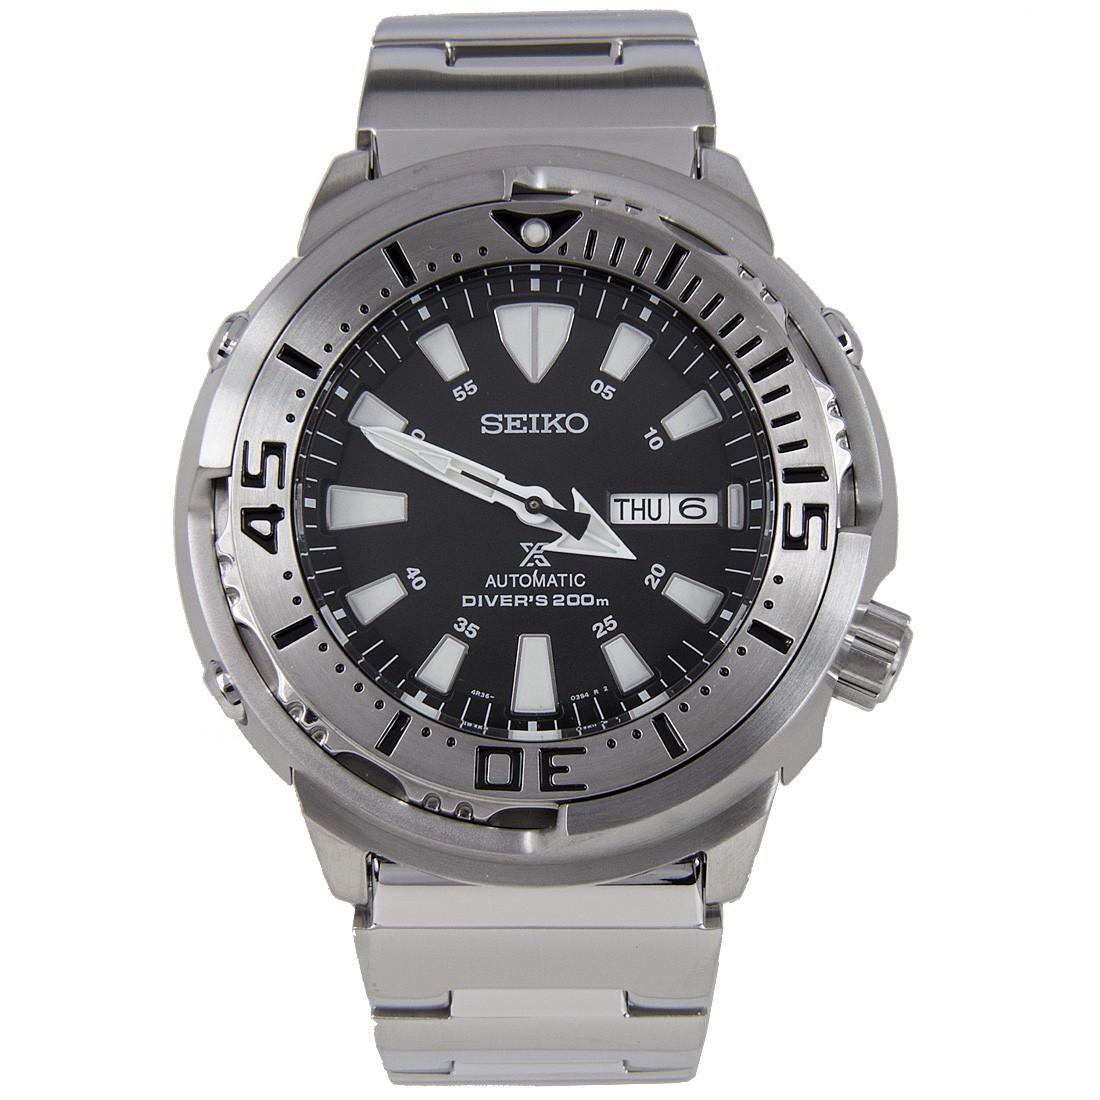 Часы Seiko Prospex SRP637K1 Automatic Diver's Baby Tuna 4R36 В